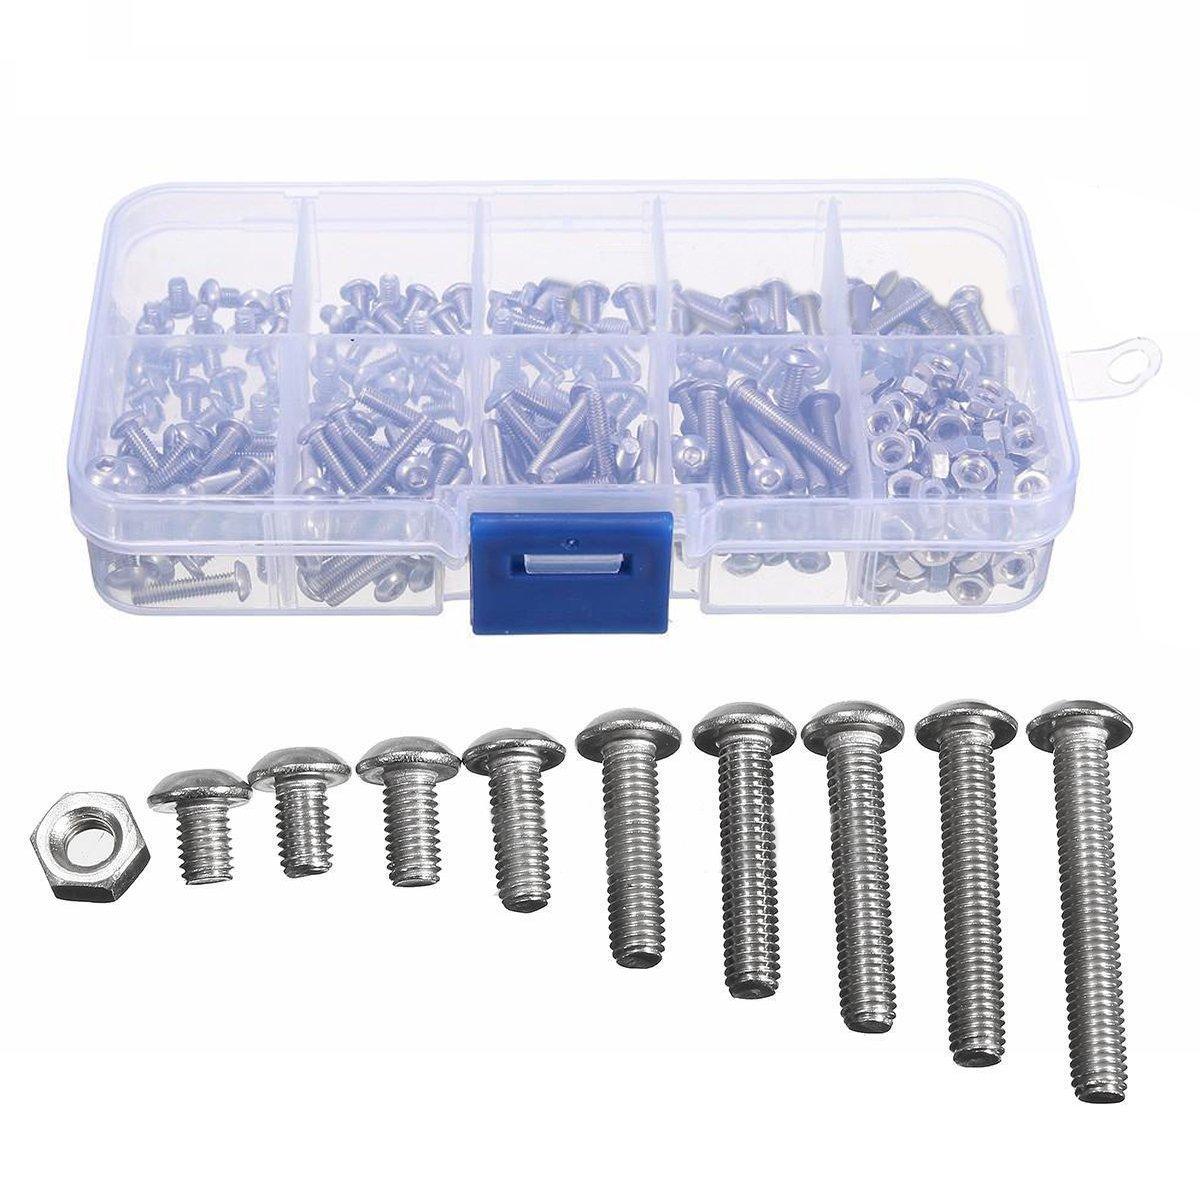 CSLU 340pcs M3 A2 Hex Screw Kit Stainless Steel Nuts Bolt Cap Socket Assortment Set For Hardware Accessories